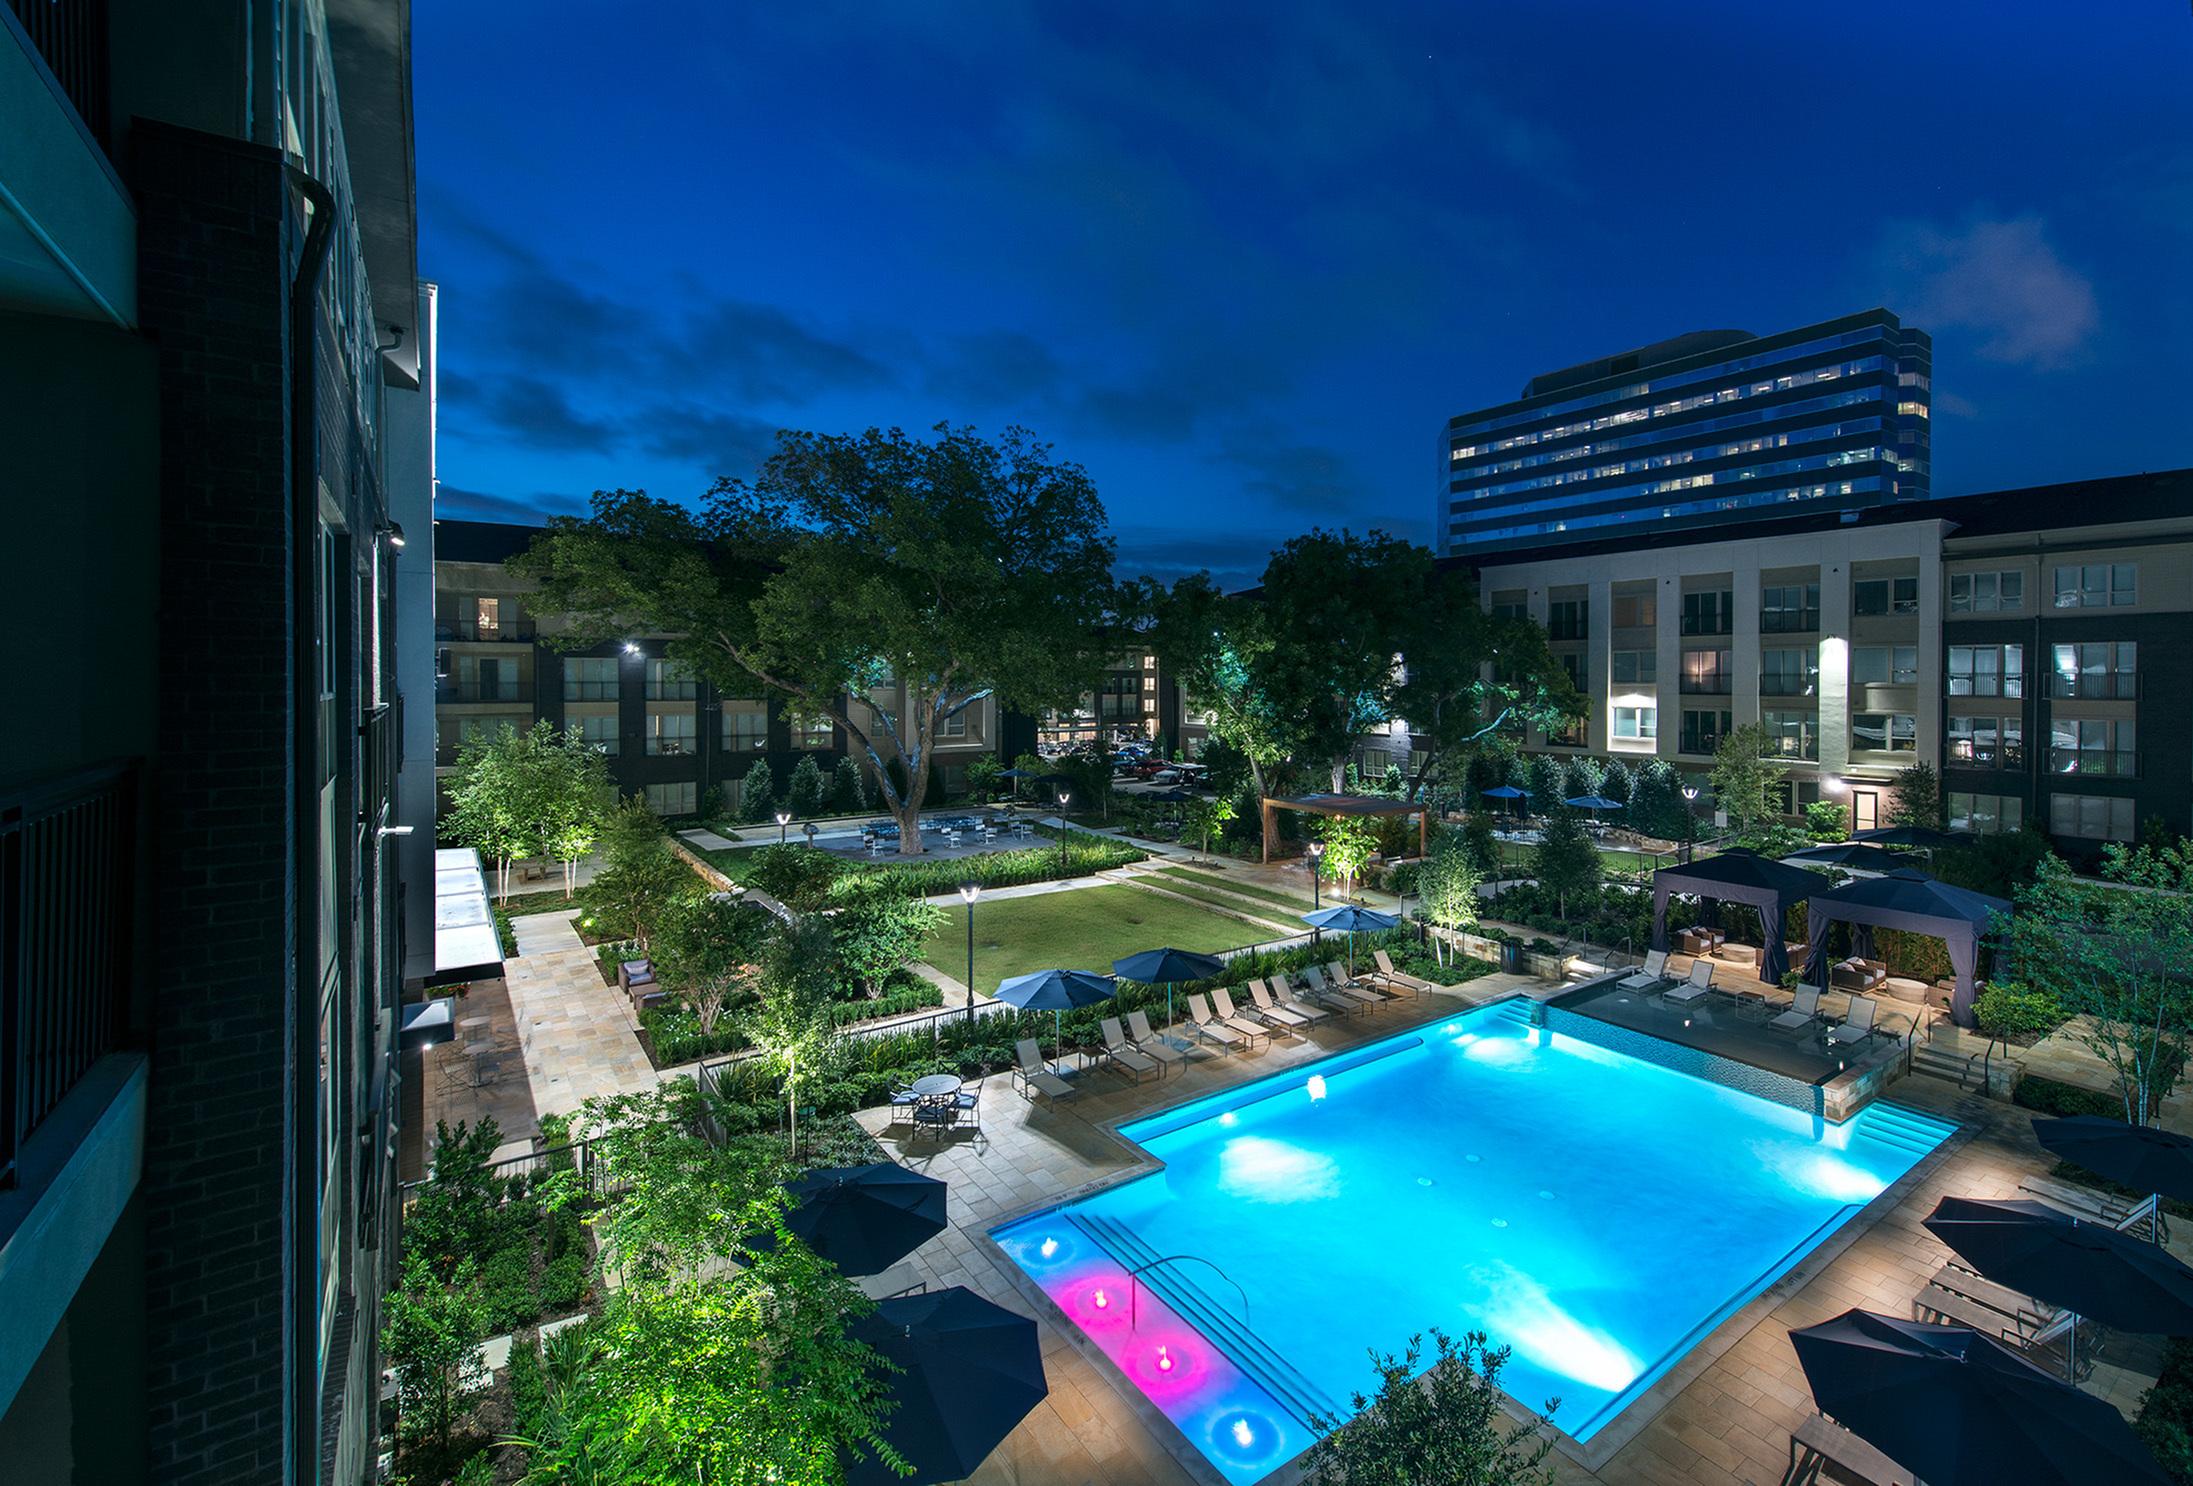 Pool at Hanover Midtown Park